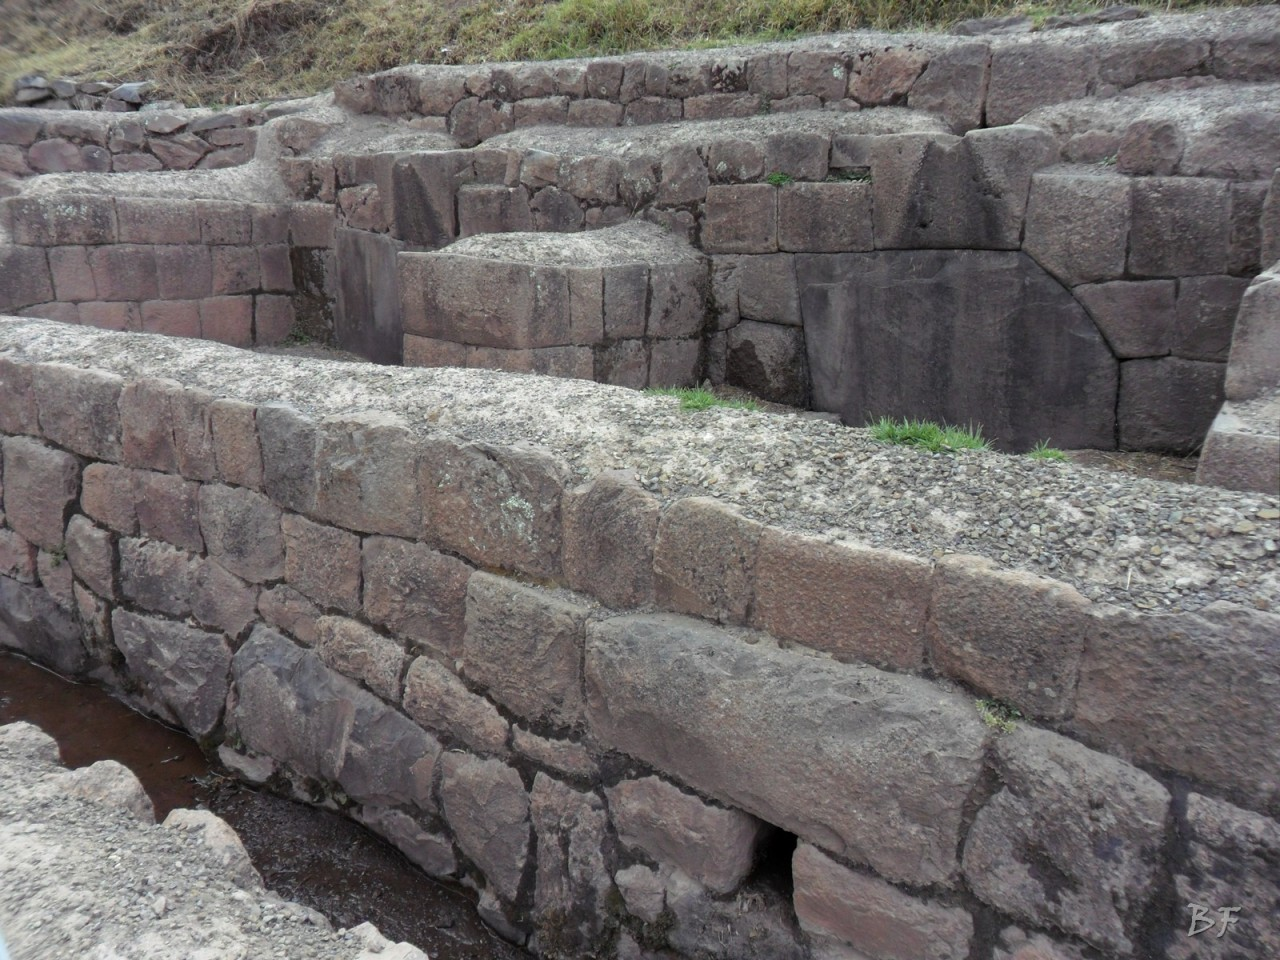 Mura-Poligonali-Megaliti-Altari-Rupestri-Pisac-Cusco-Perù-10